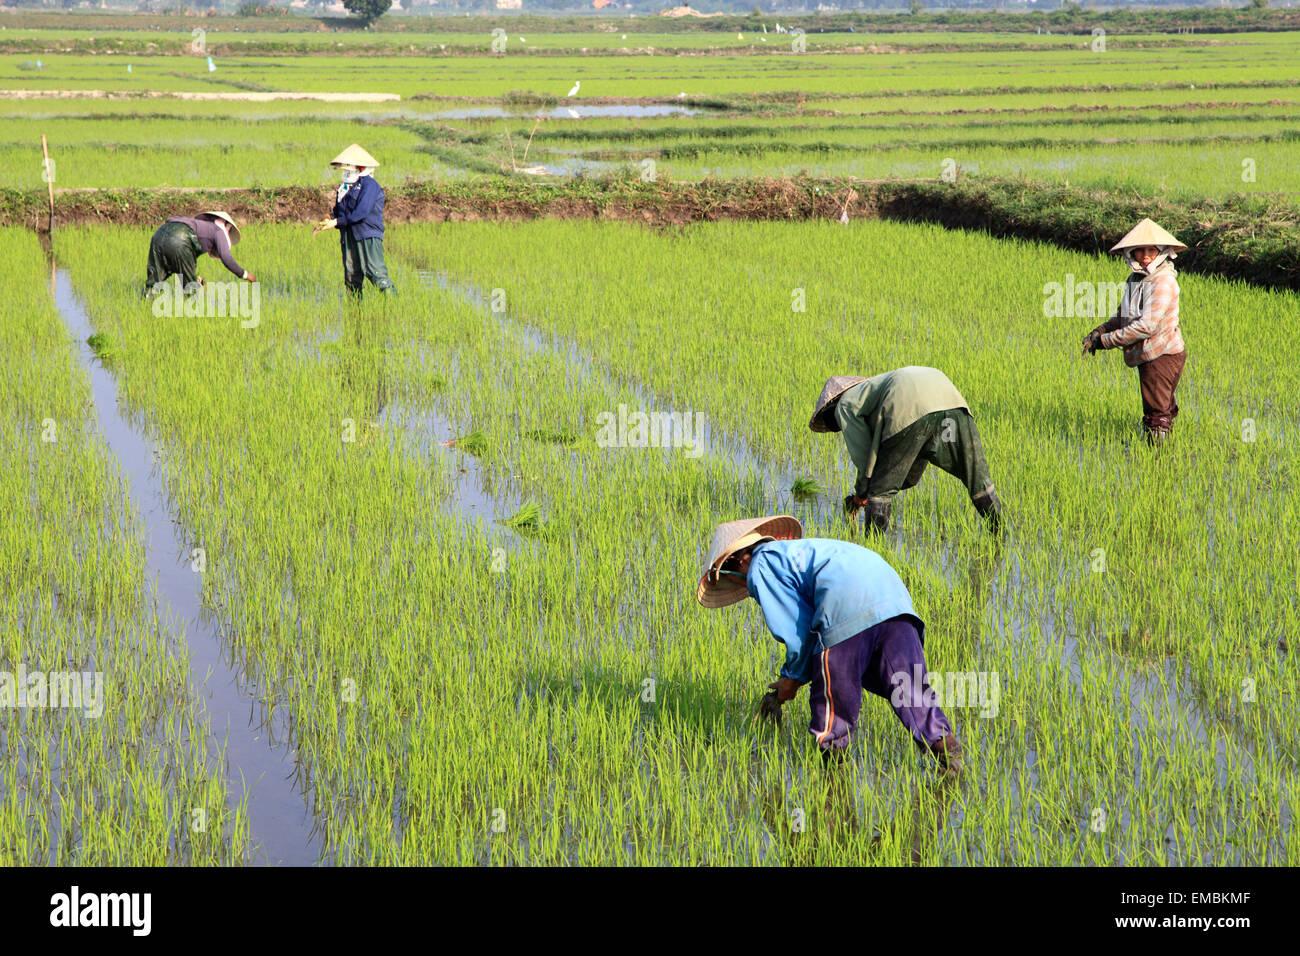 Vietnam, Hoi An, rice field, farmers working, - Stock Image